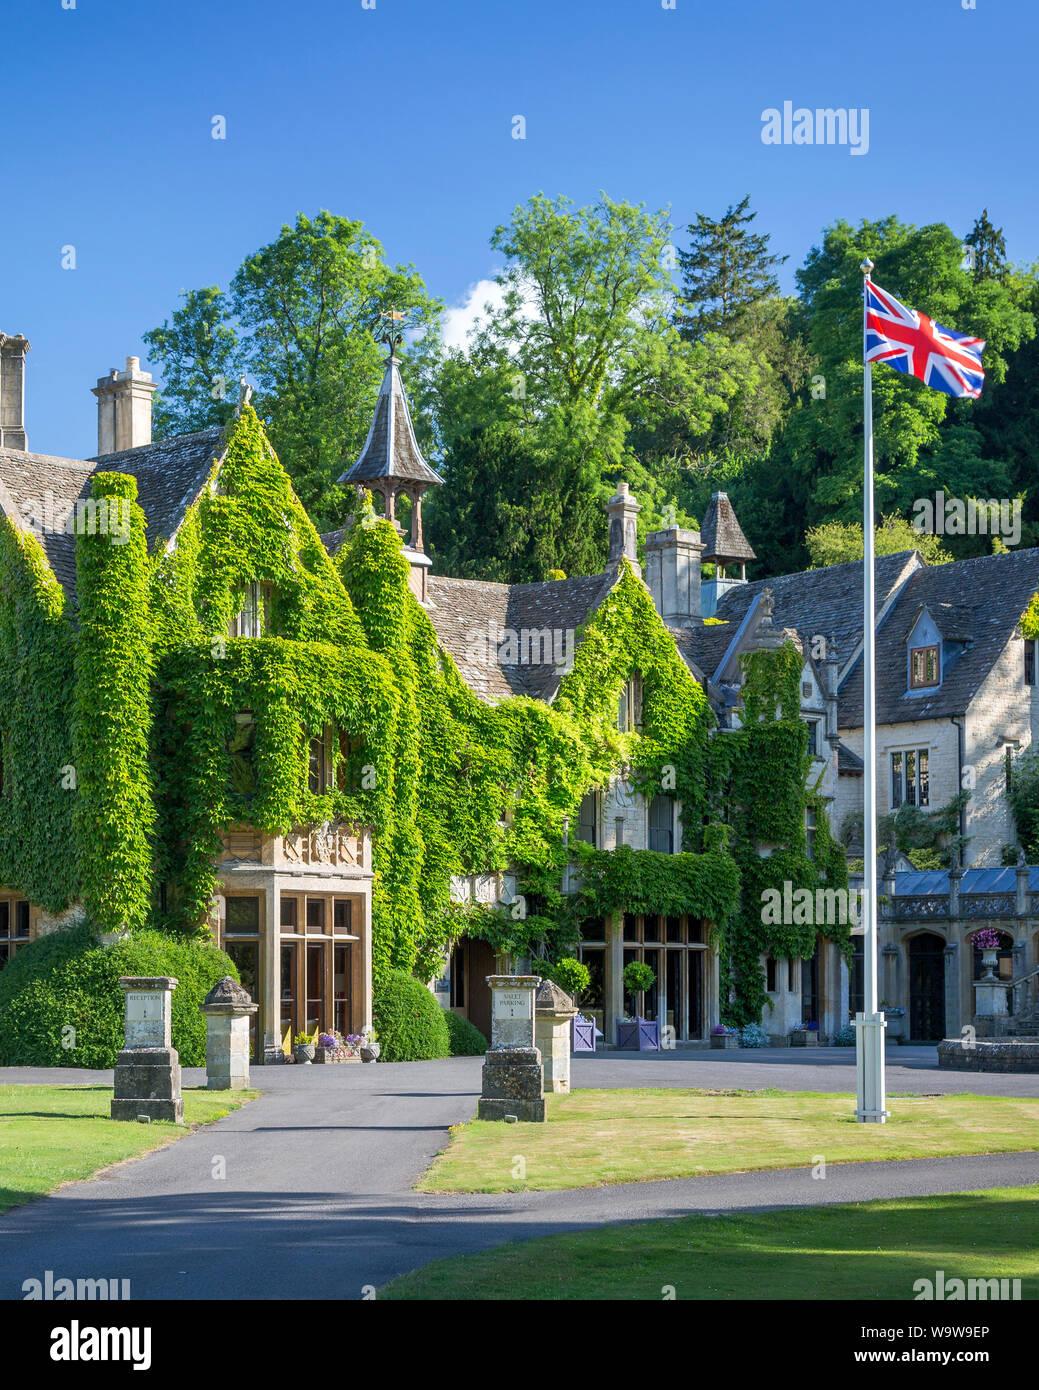 Manor House Hotel, Castle Combe, los Cotswolds, Wiltshire, Inglaterra Foto de stock